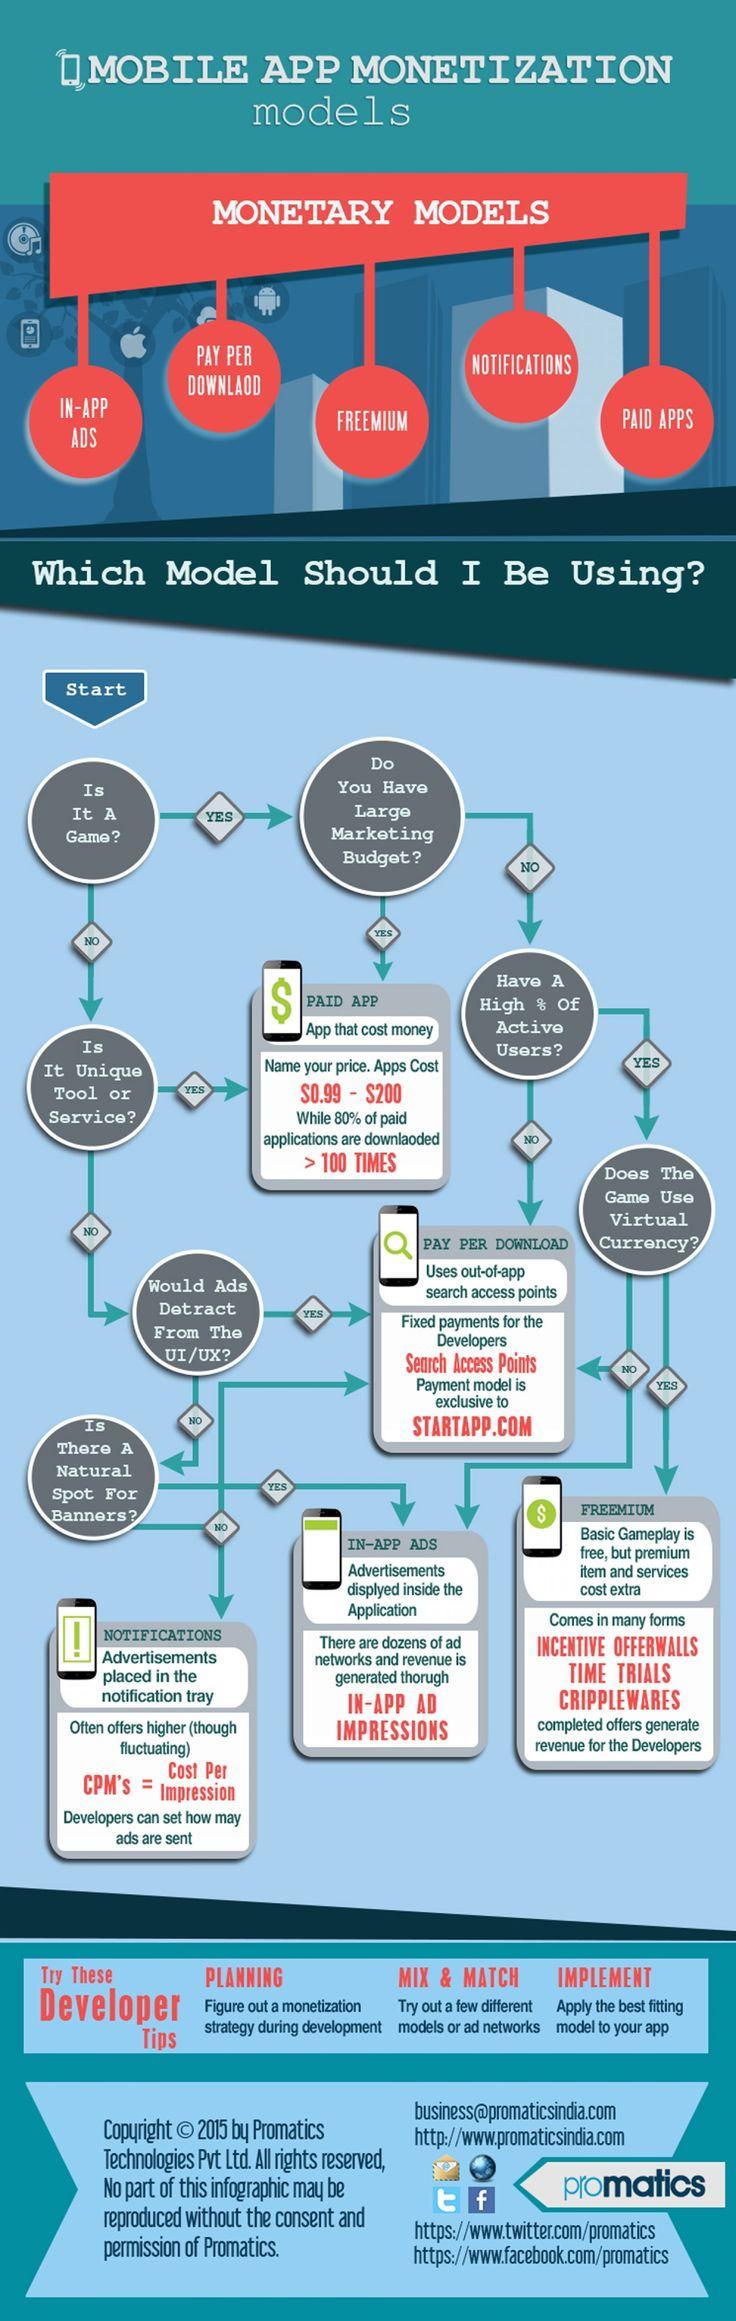 Strategy For Successful Mo desu app  bile App Monetization